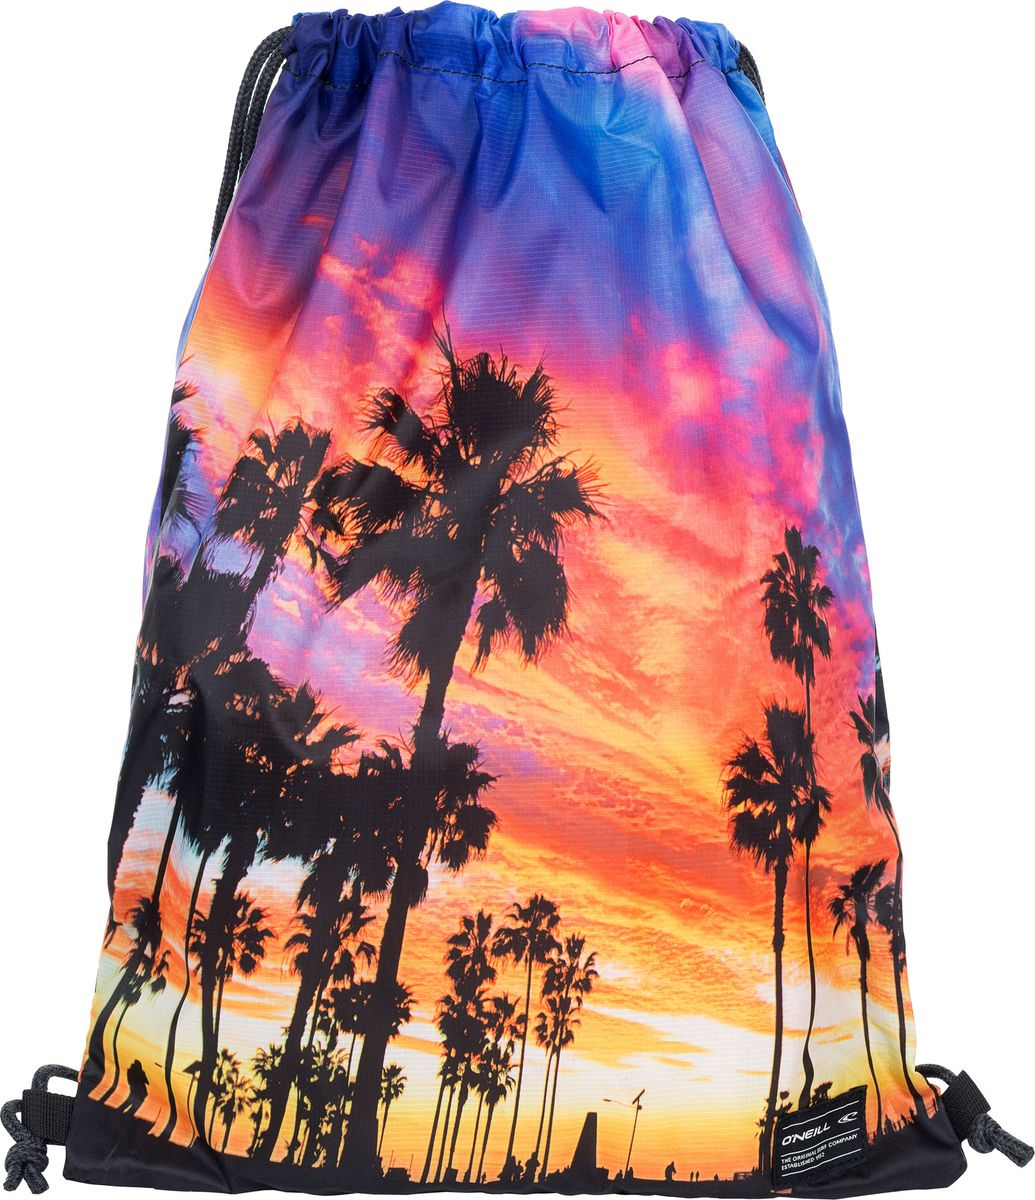 Рюкзак O'Neill Bm Photoprint Gymsack рюкзак мешок nike fb gymsack 3 0 ba5094 435